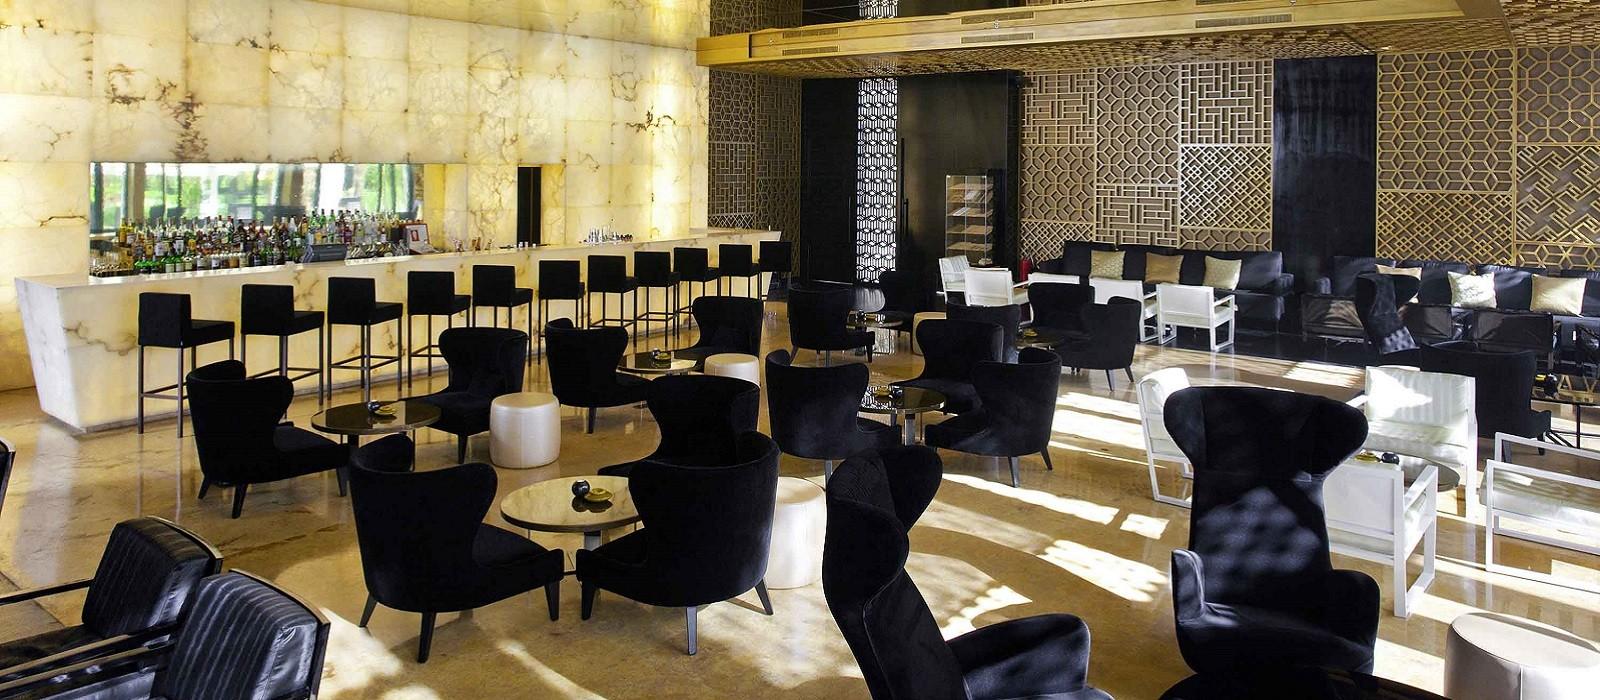 Sofitel Jardin Des Roses Hotel in Morocco   ENCHANTING TRAVELS